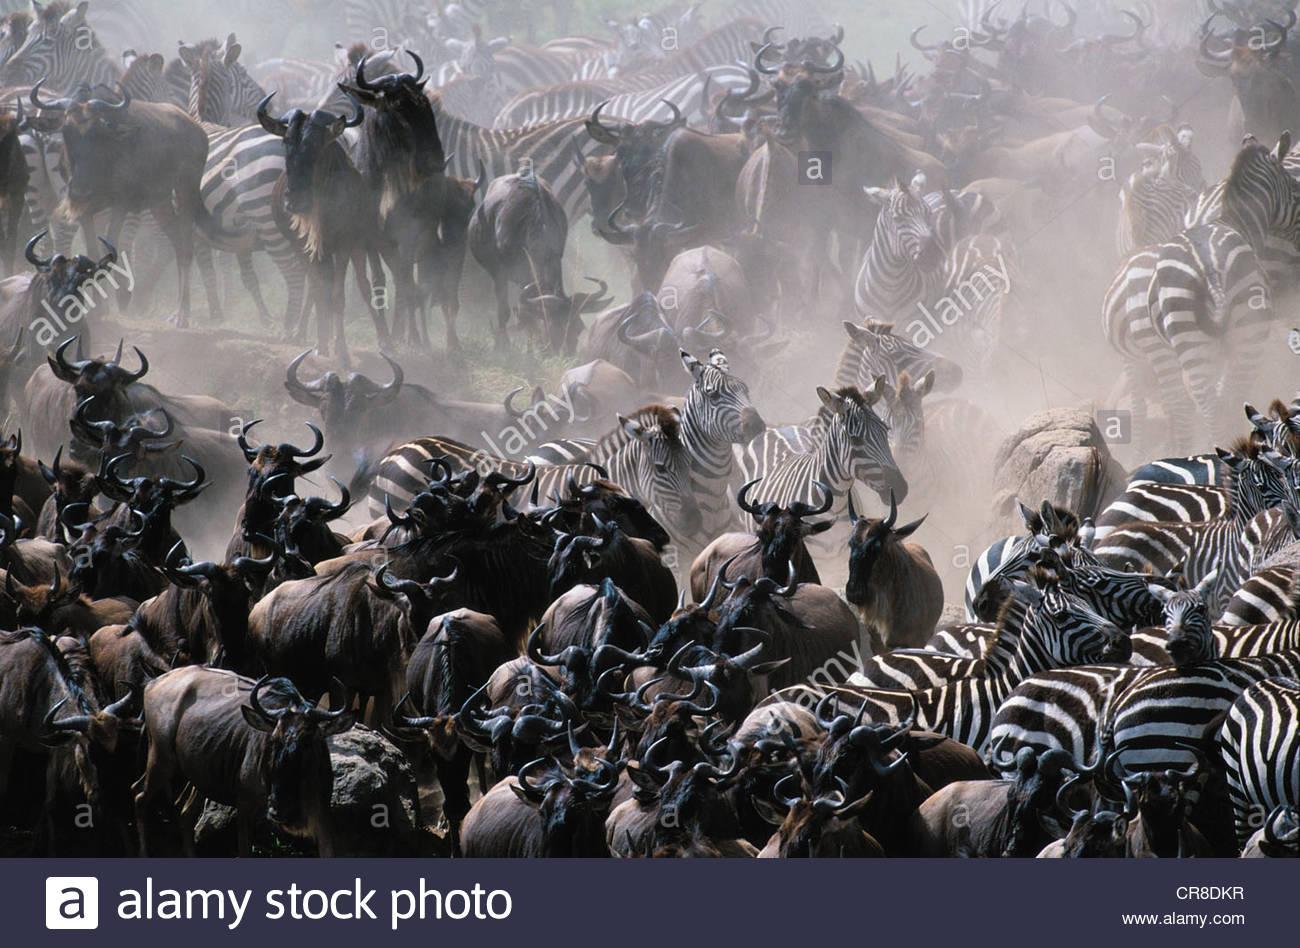 Plains Zebra and Common Wildebeest herds, Masai Mara National Reserve, Kenya - Stock Image